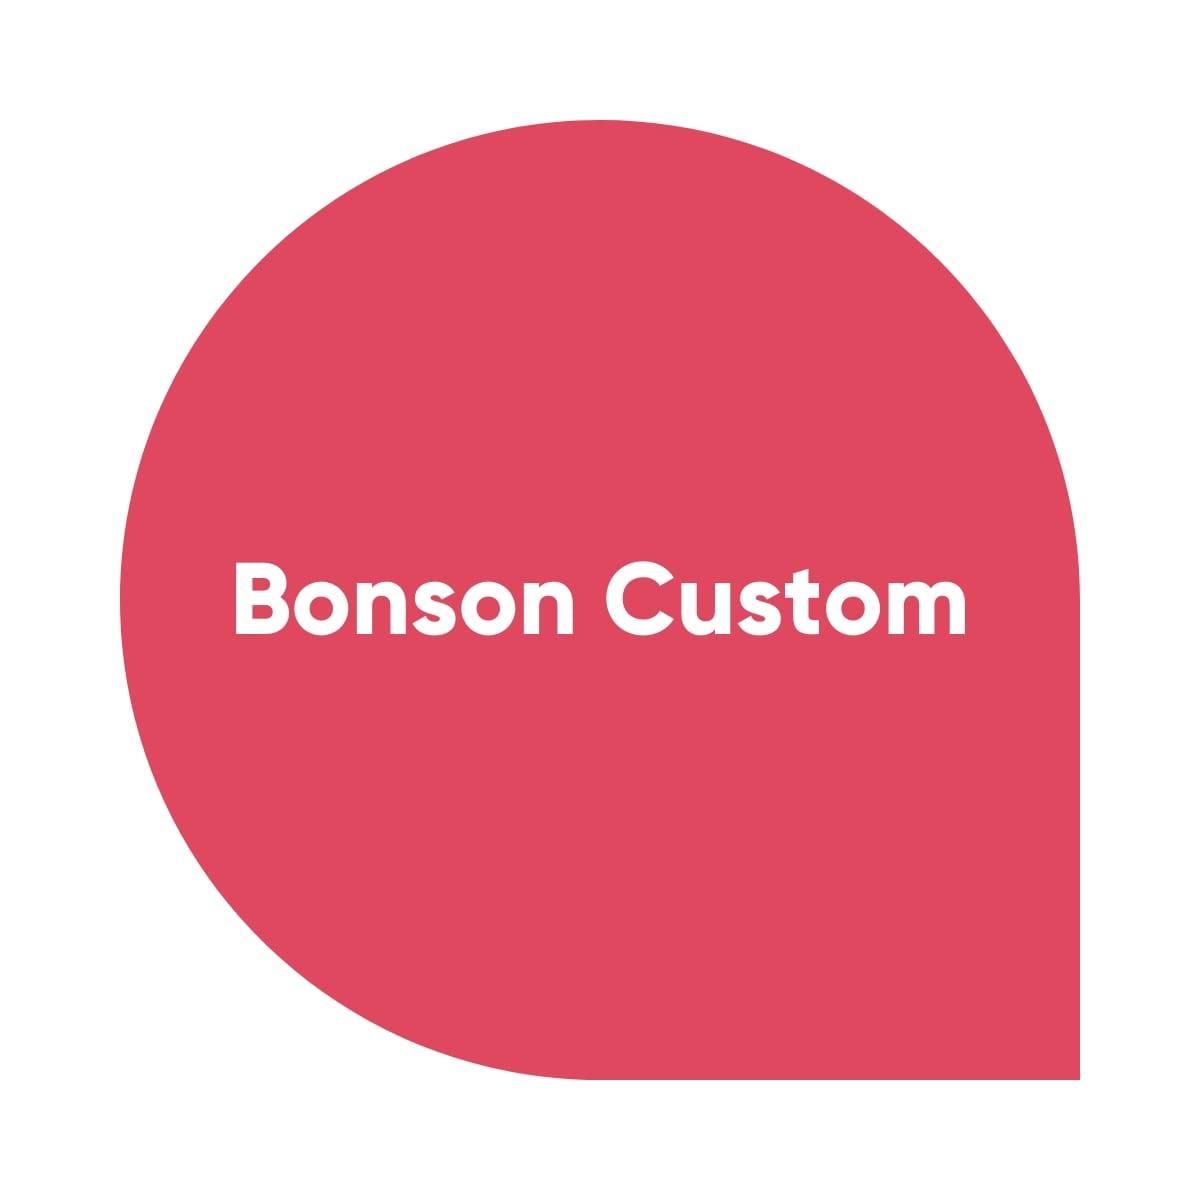 Bonson_custom-teardot